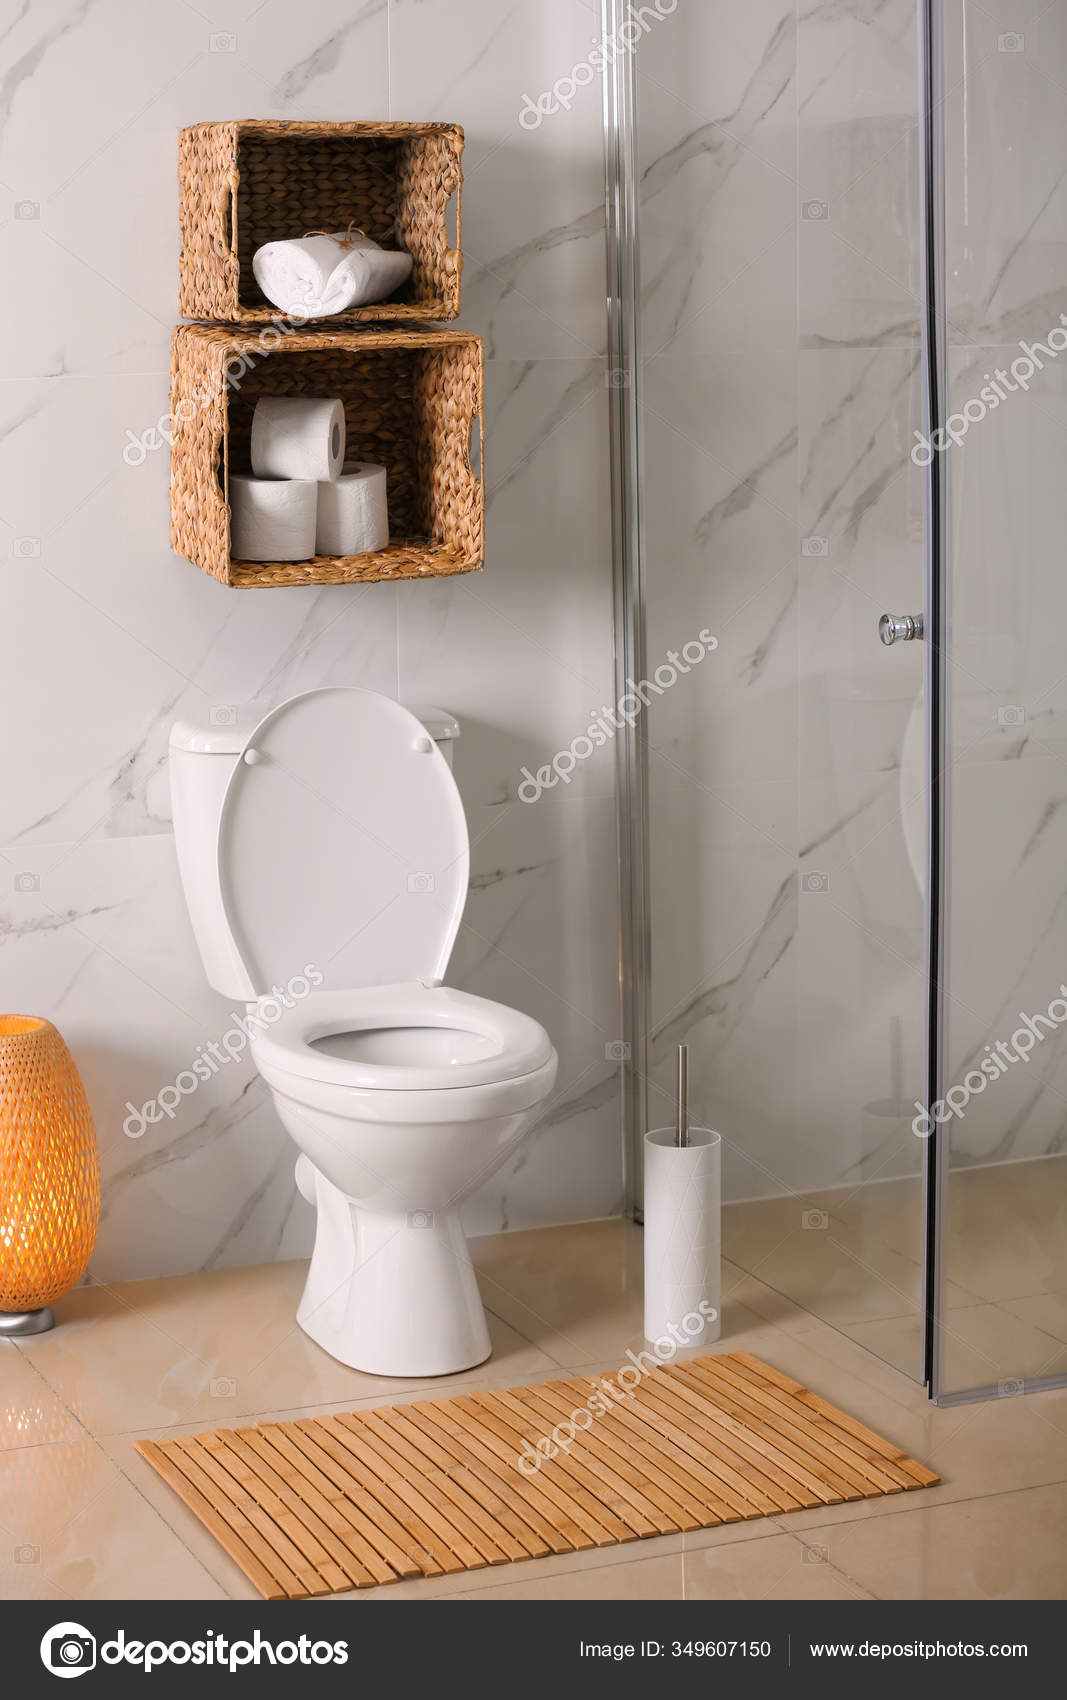 White Toilet Bowl Marble Wall Bathroom Stock Photo C Liudmilachernetska Gmail Com 349607150